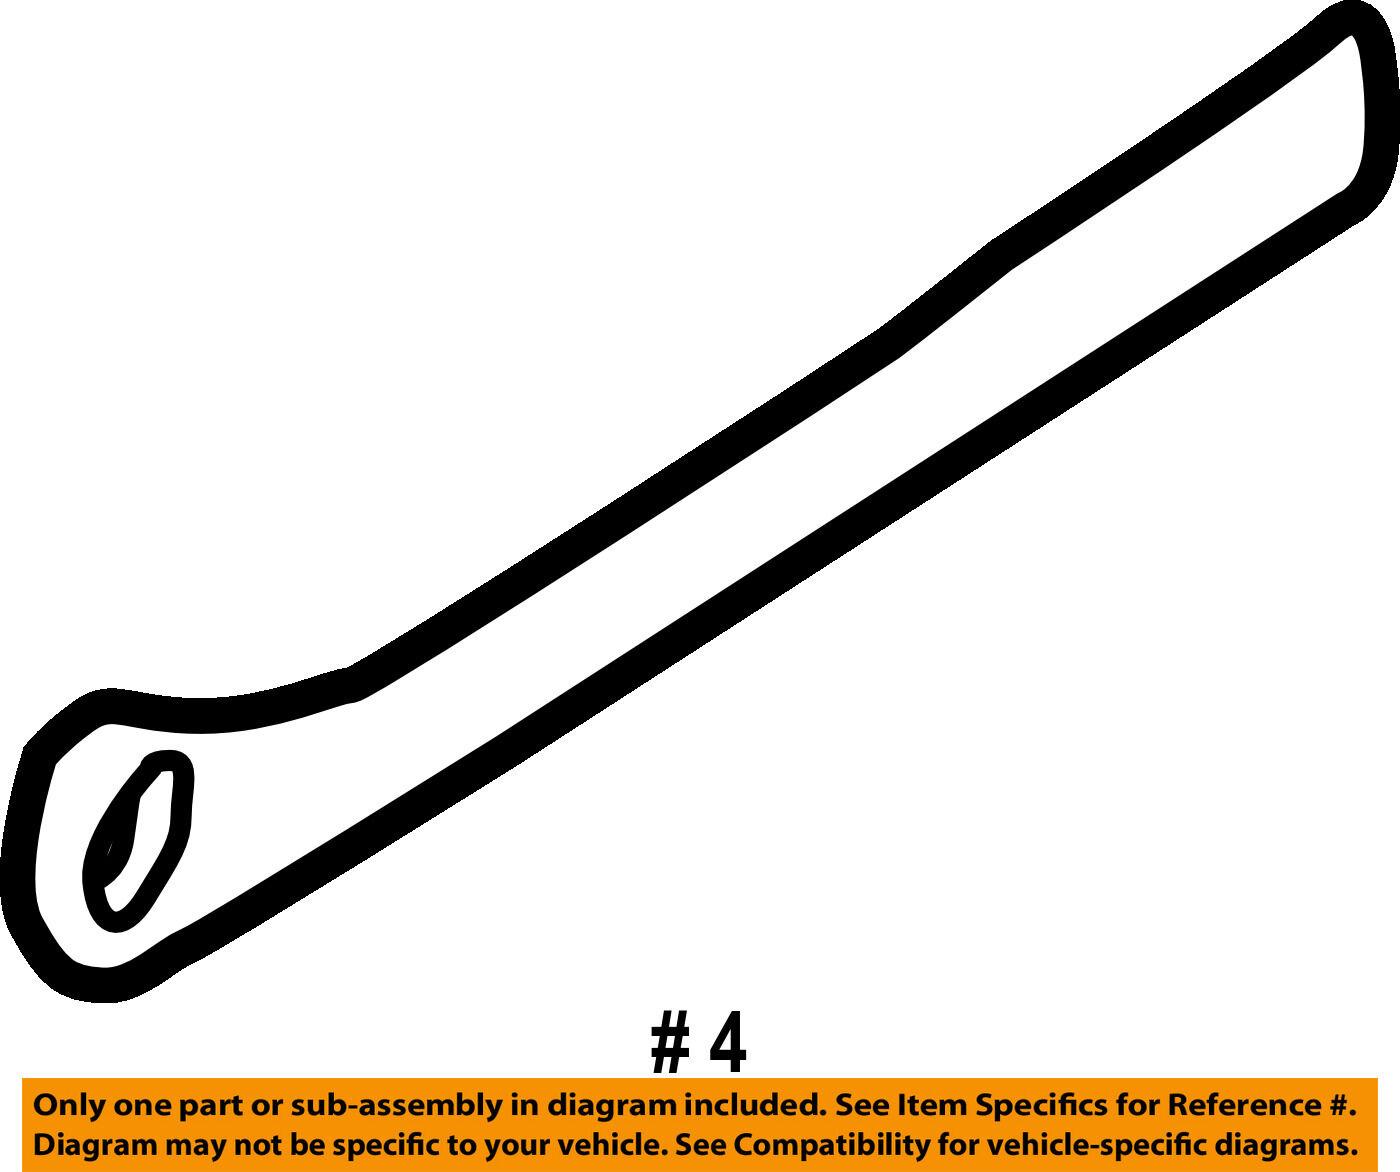 Chrome Finish 1-1//8 Length Martin Sprocket 1-1//8 Length 12 Points Standard Martin BM612 12mm Type II Opening 3//8 Square Drive Socket